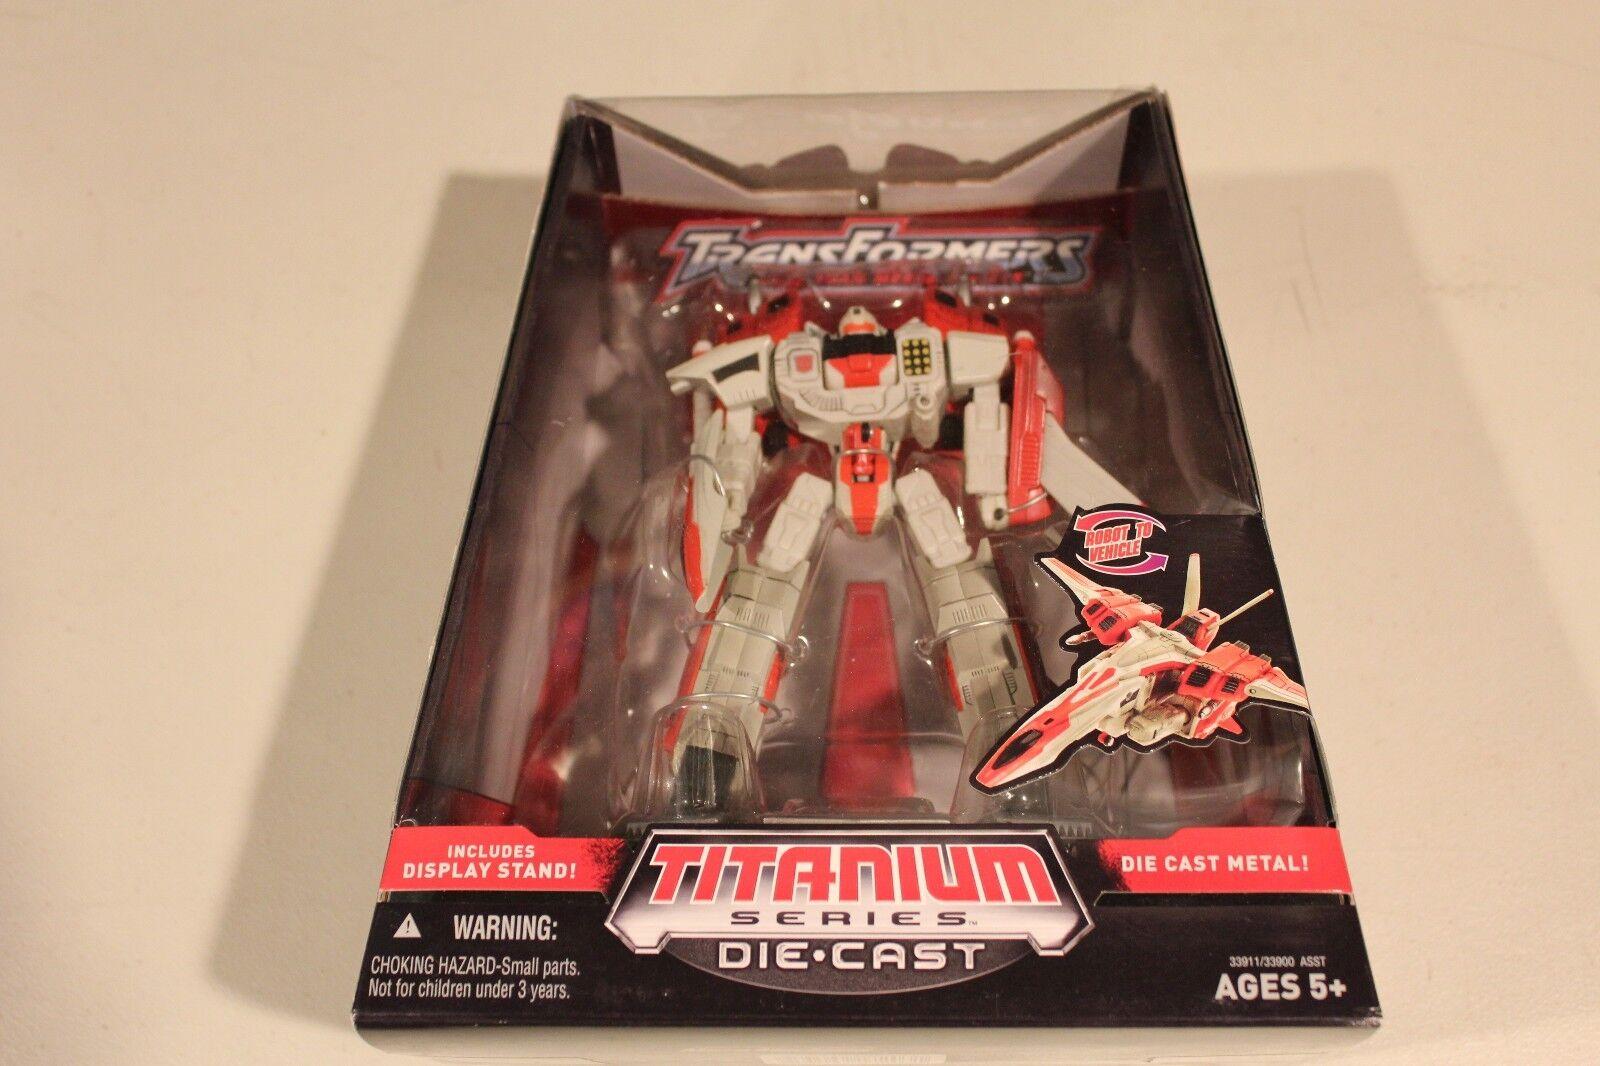 Hasbro Titanium Series Die-cast Transformers Jetfire